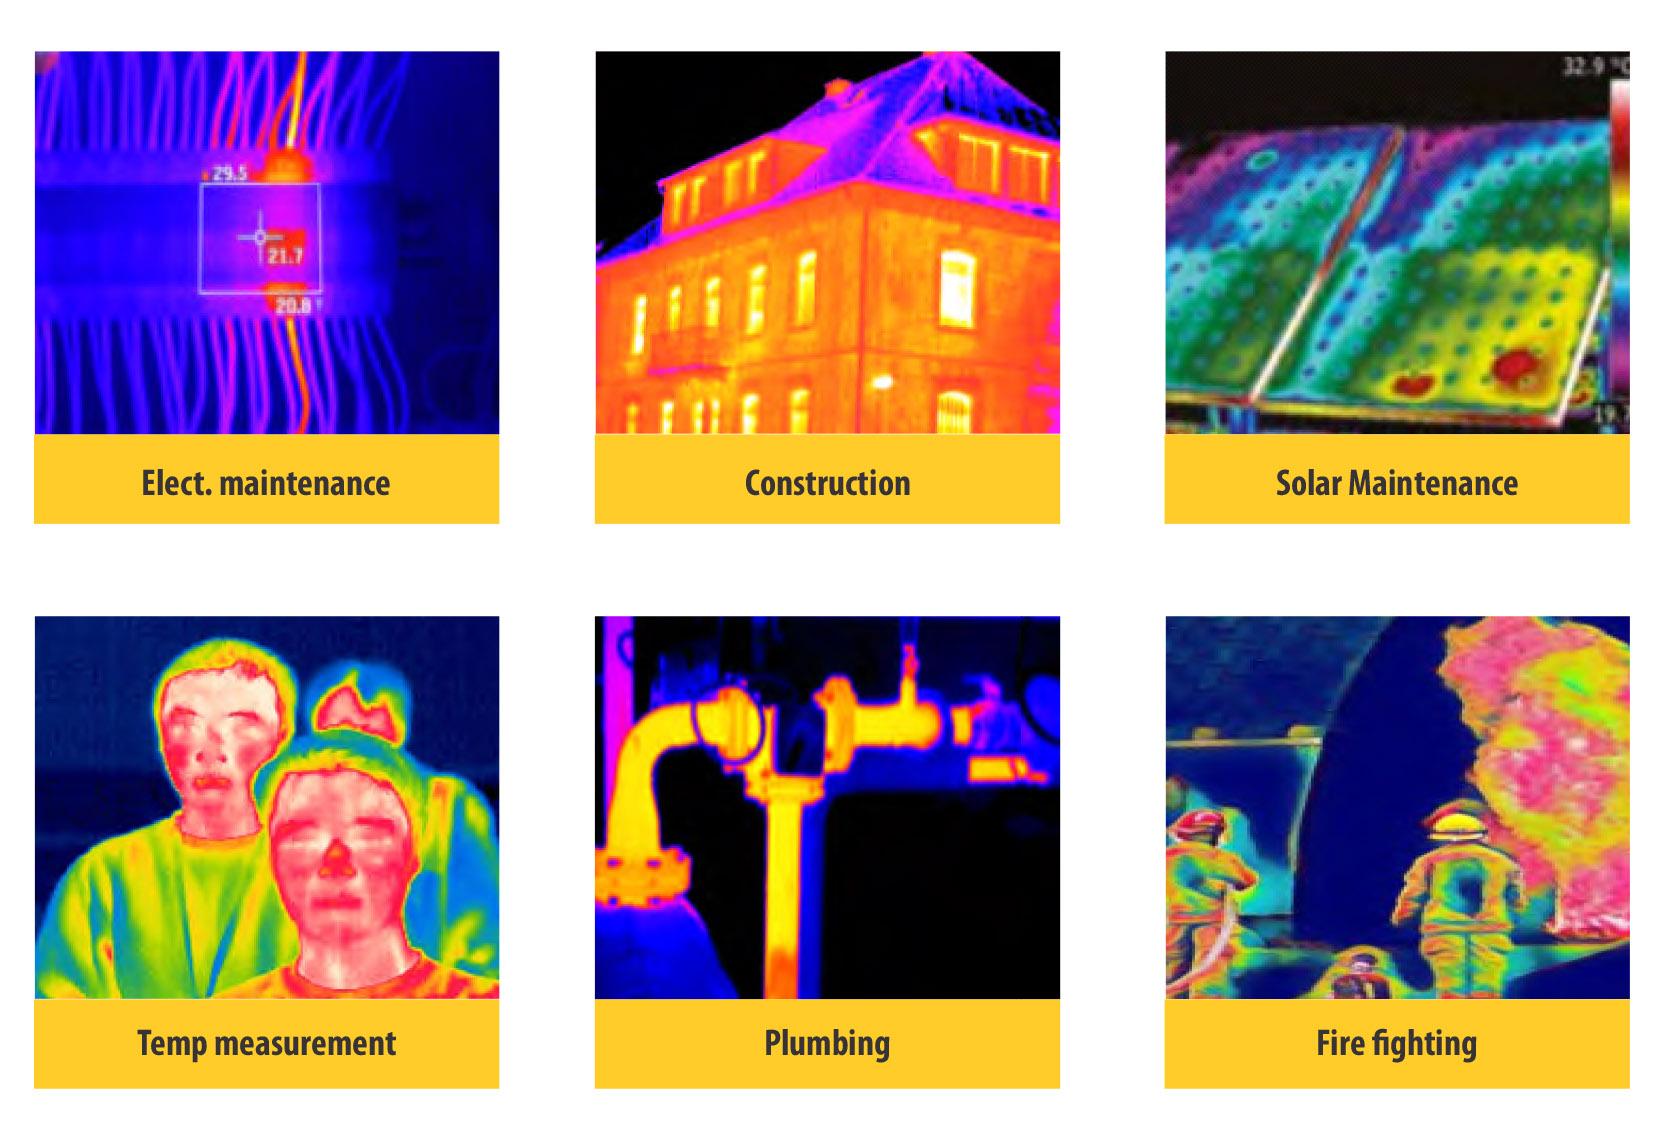 Body Temperature Detection Camera